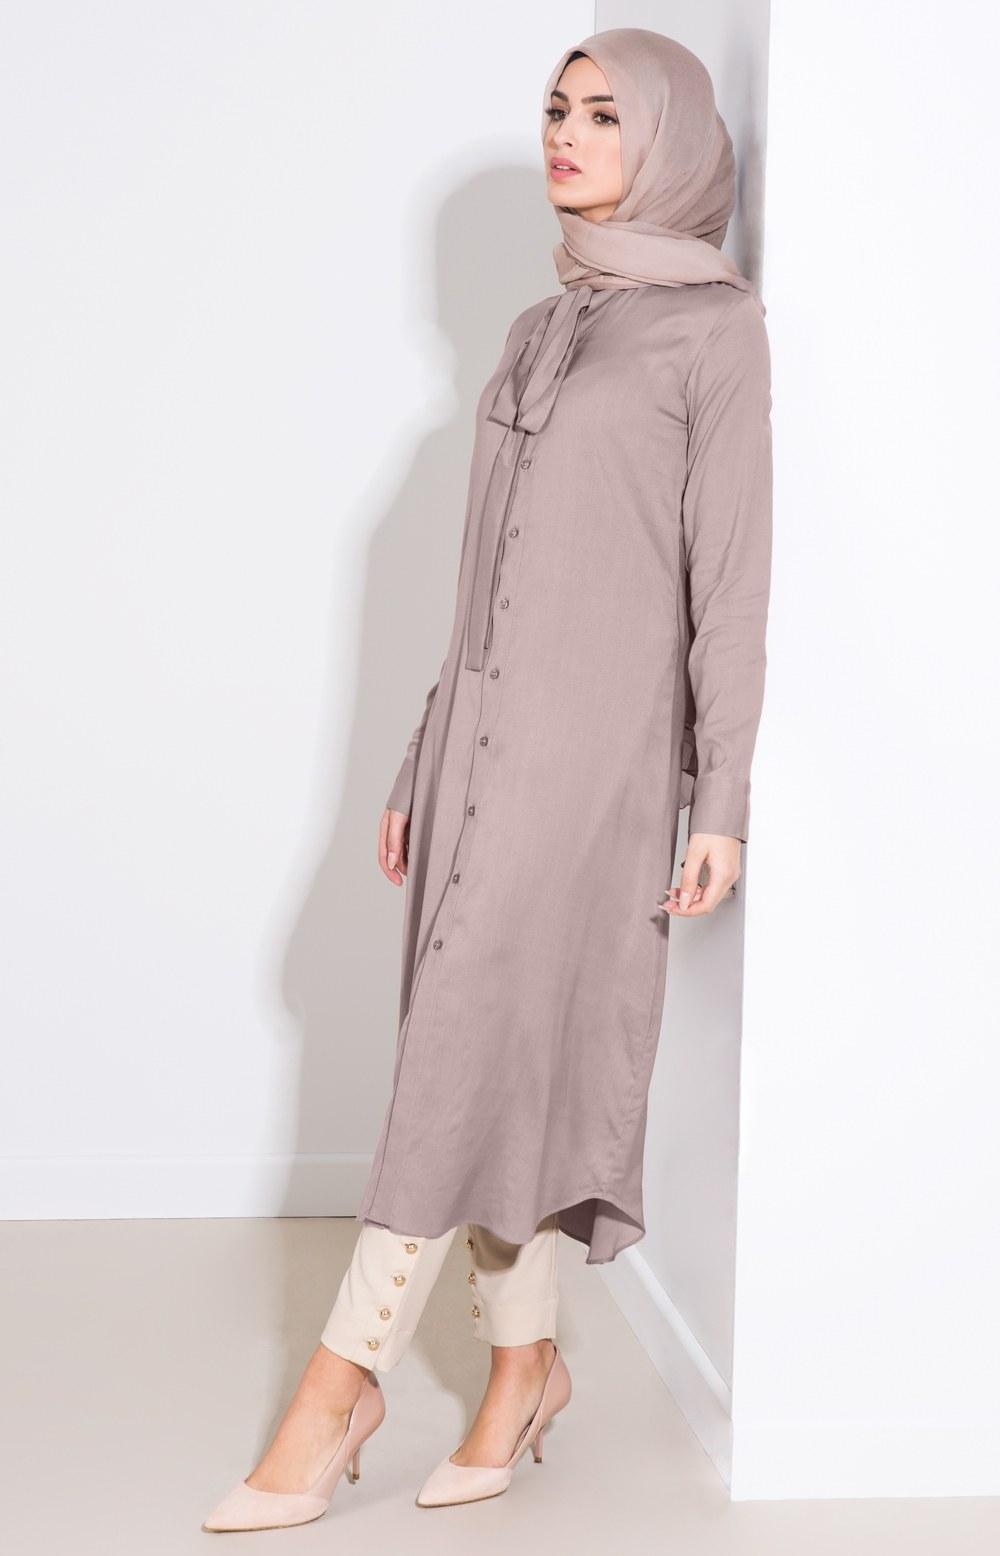 Design Model Baju Lebaran Muslimah Jxdu 25 Trend Model Baju Muslim Lebaran 2018 Simple & Modis